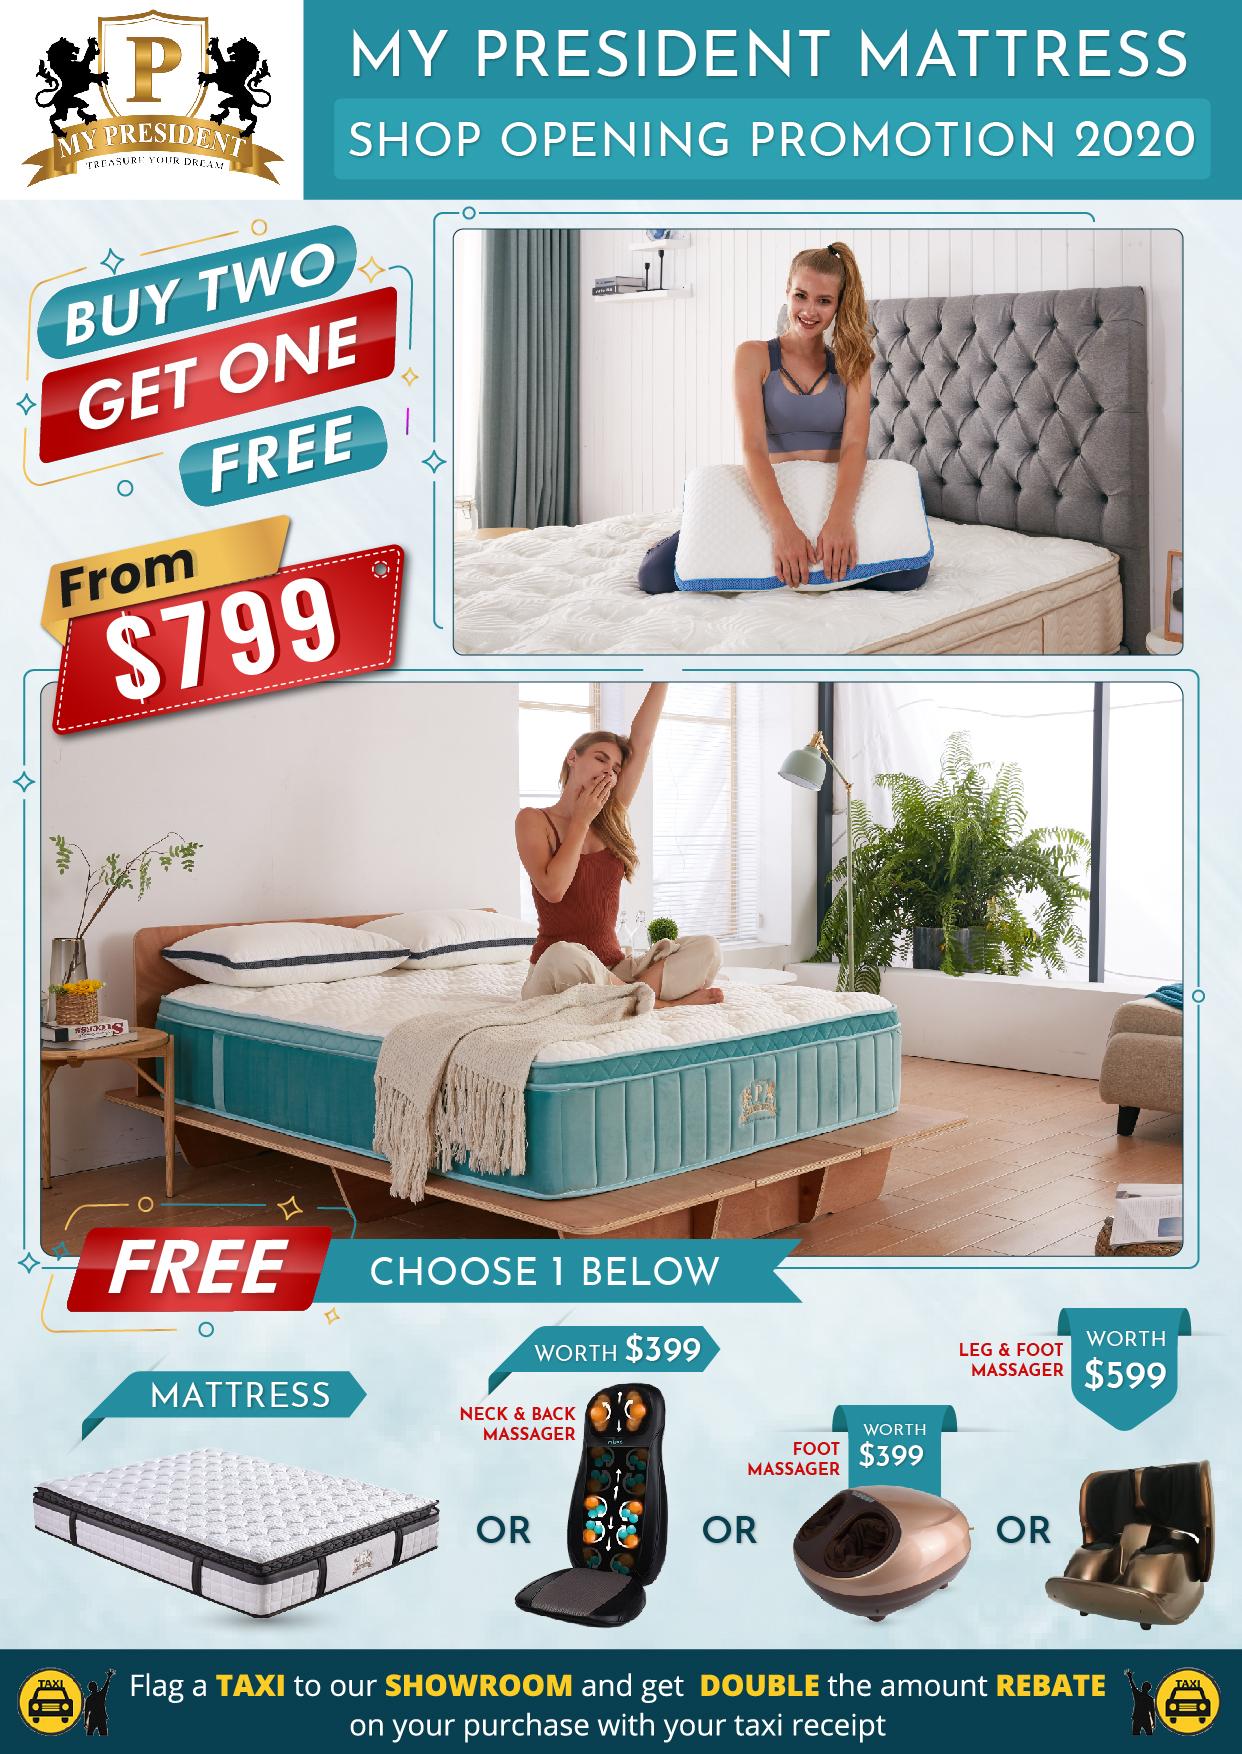 My President Mattress - Buy 2 Get 1 FREE Mattress